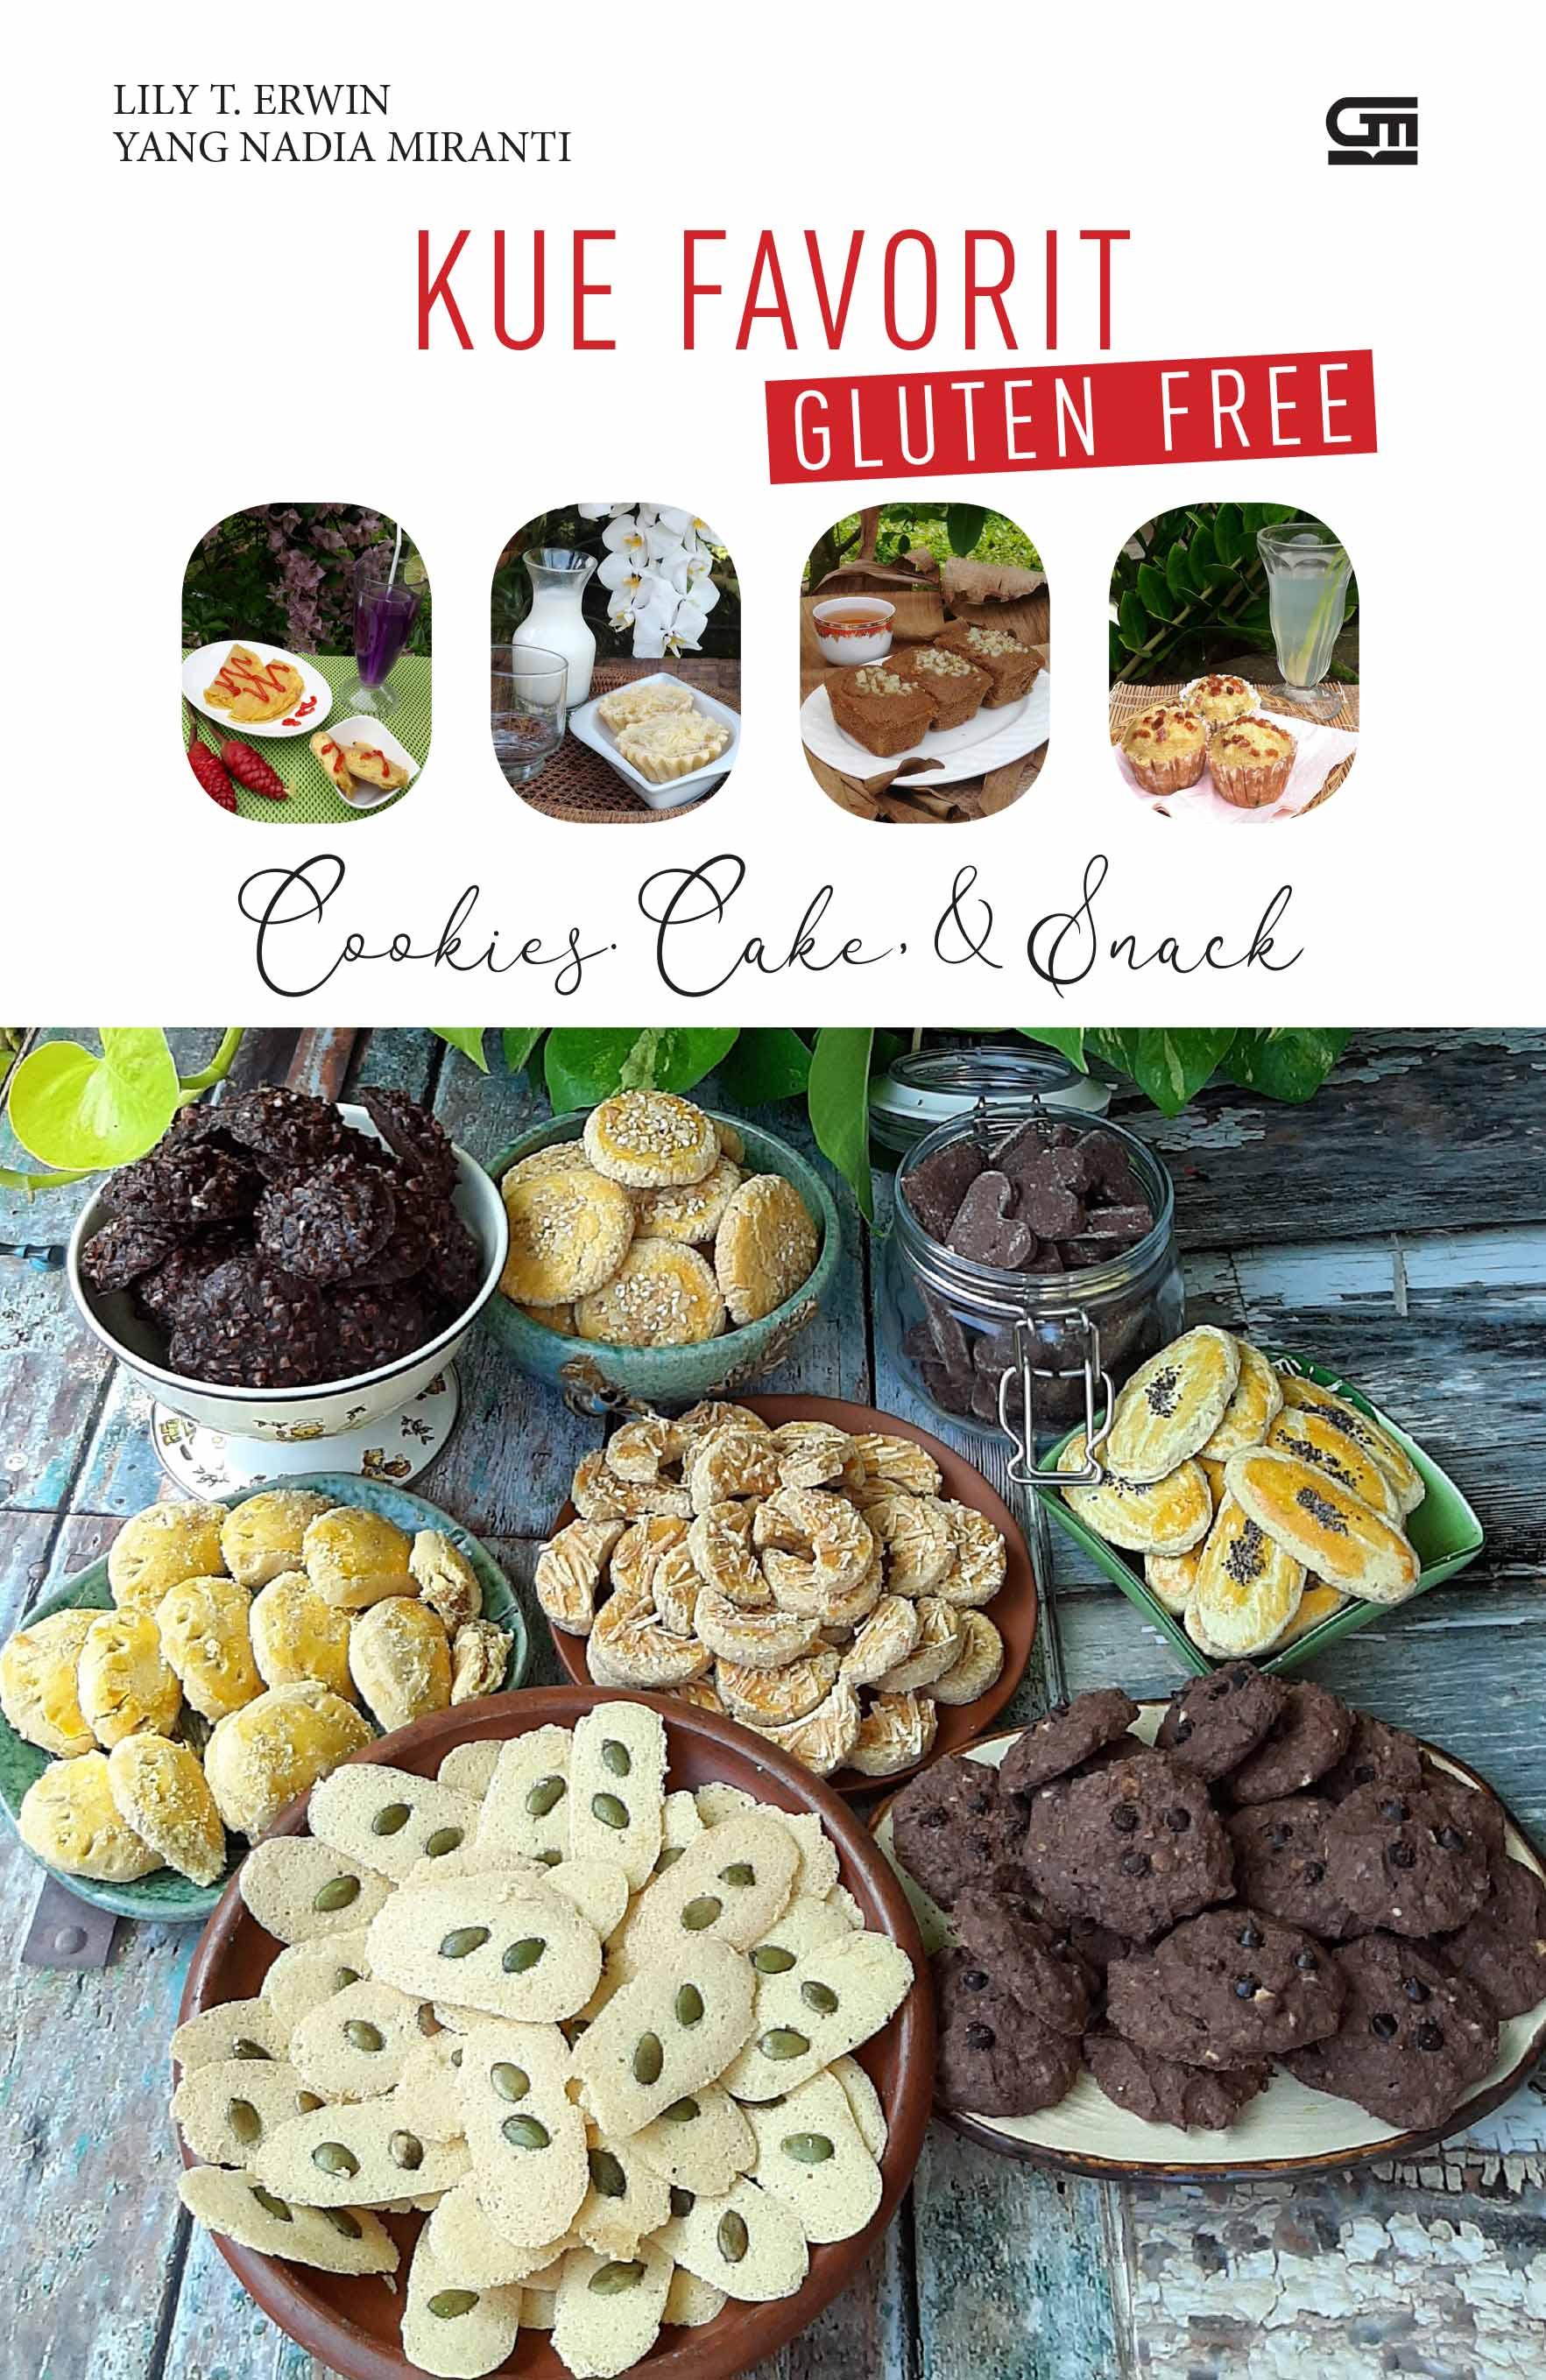 Kue Favorit Gluten Free--Cookies, Cake & Snack